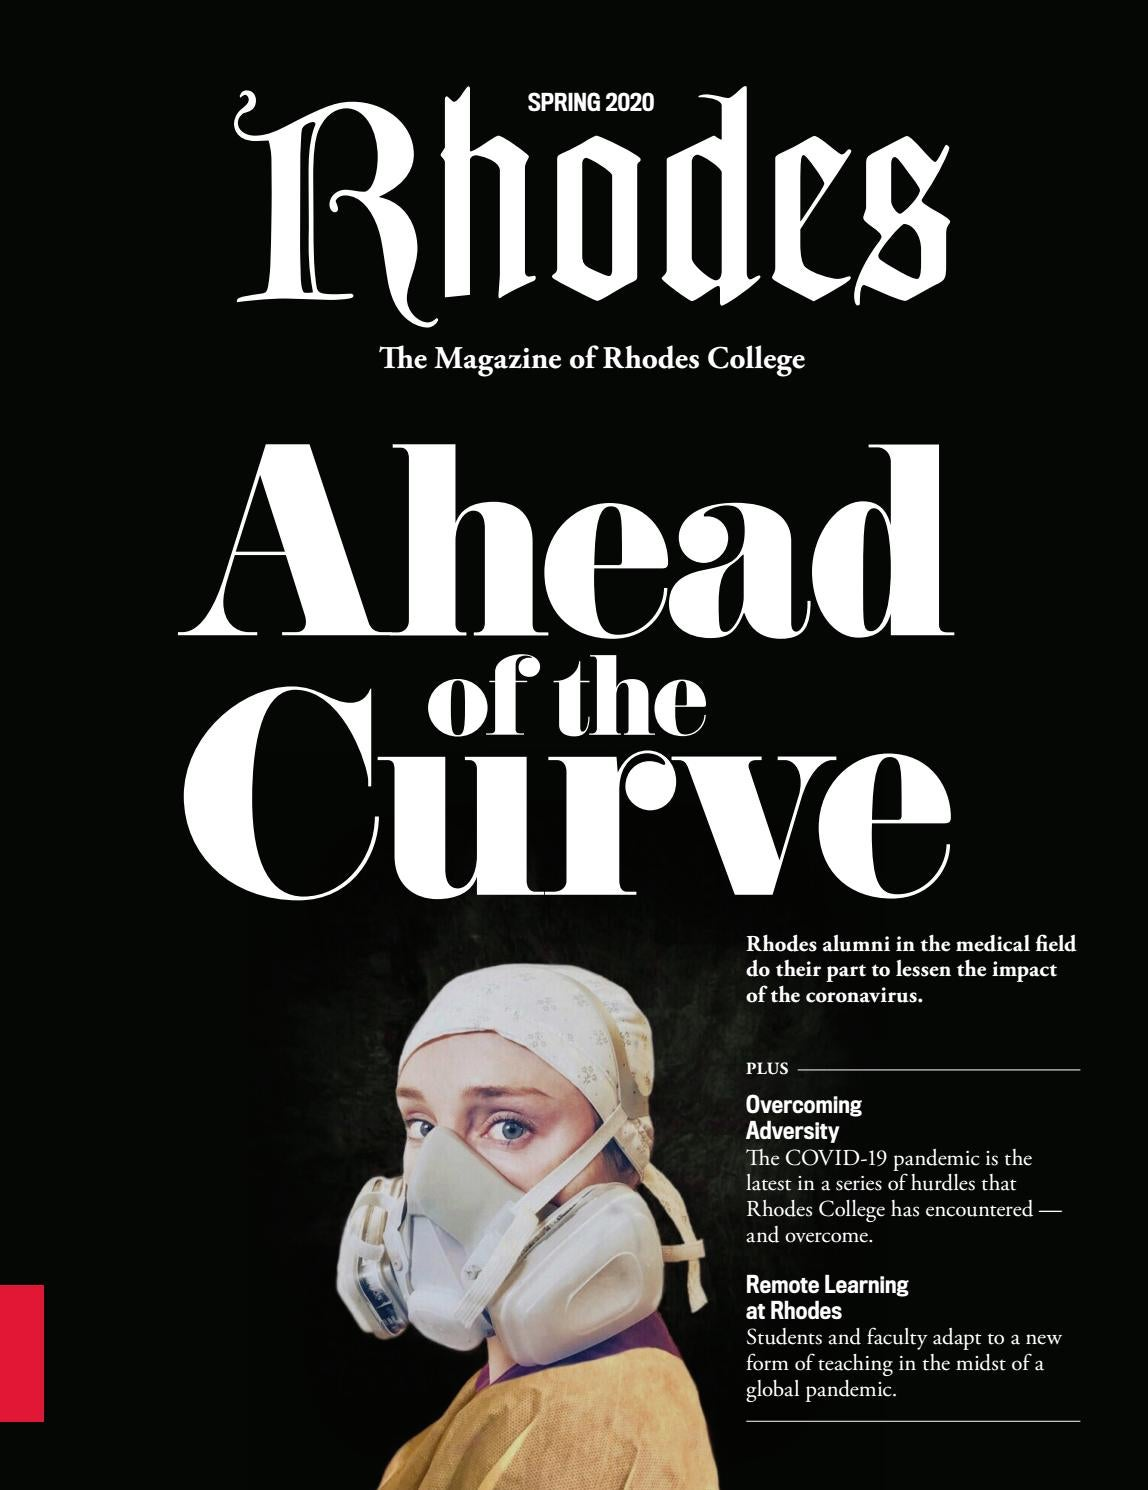 Rhodes College Calendar 2022.Rhodes Magazine Spring 2020 By Contemporary Media Issuu